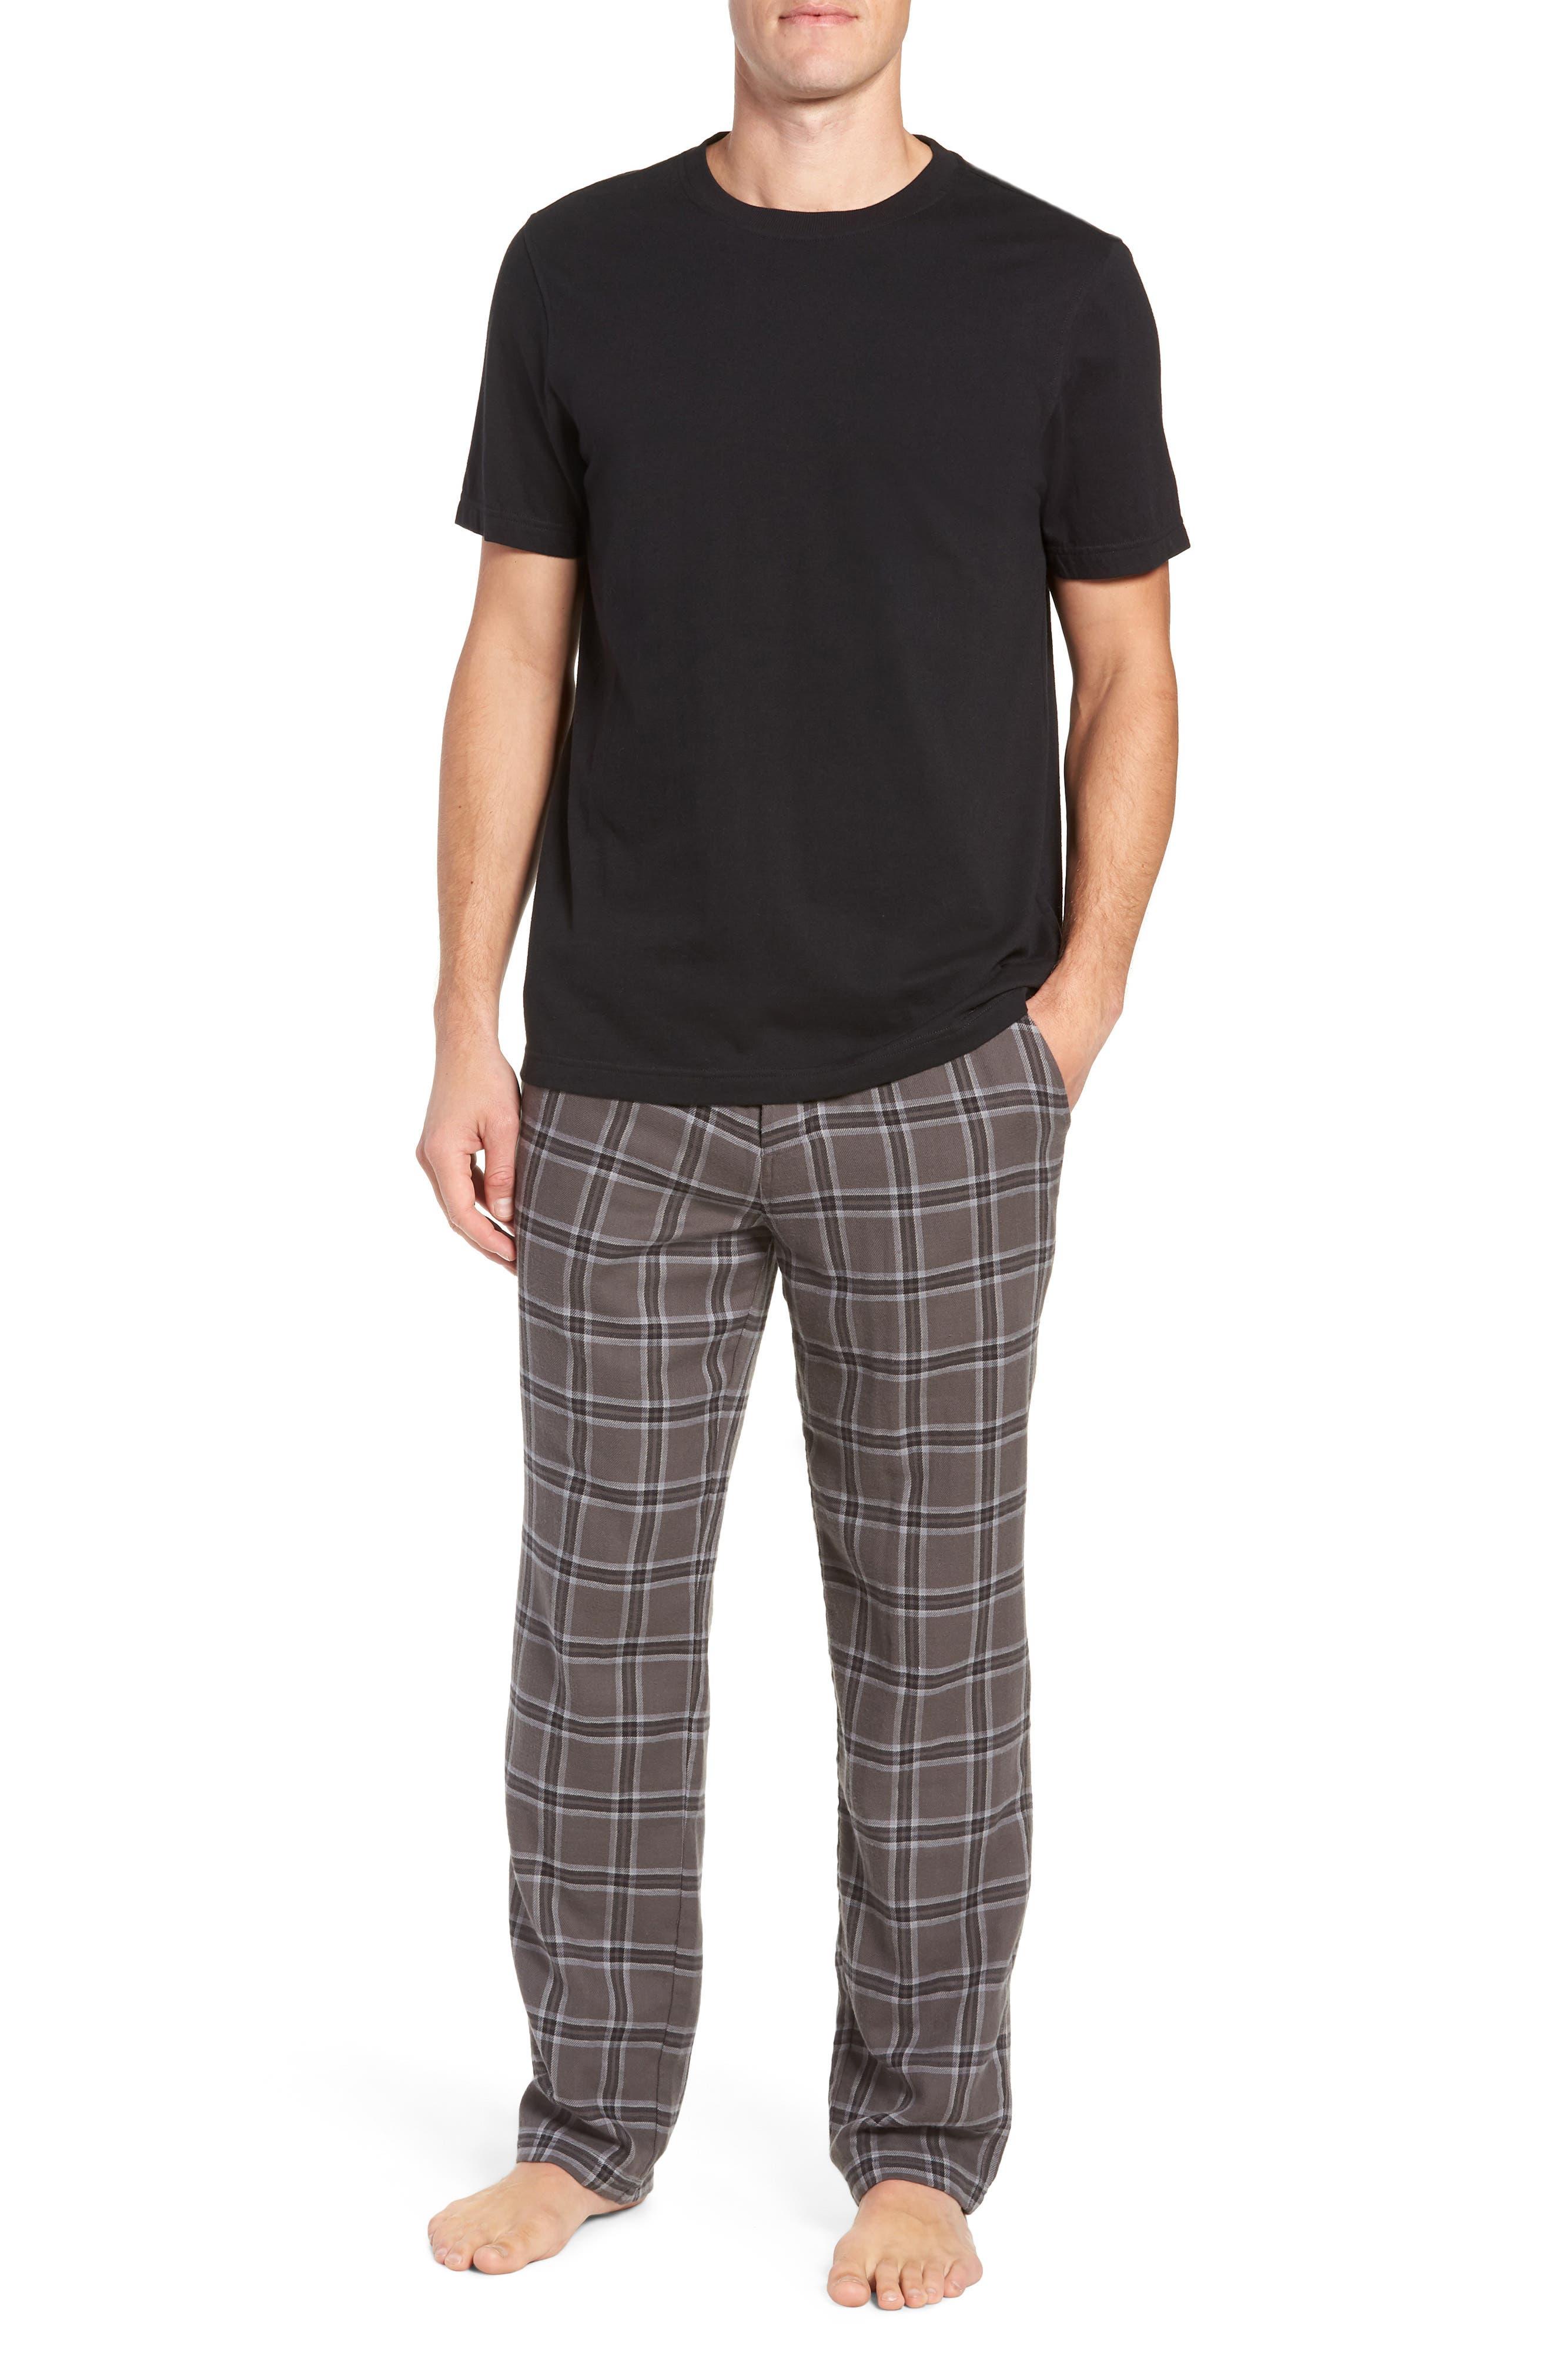 Grant Pajama Set,                             Main thumbnail 1, color,                             CHARCOAL/ BLACK